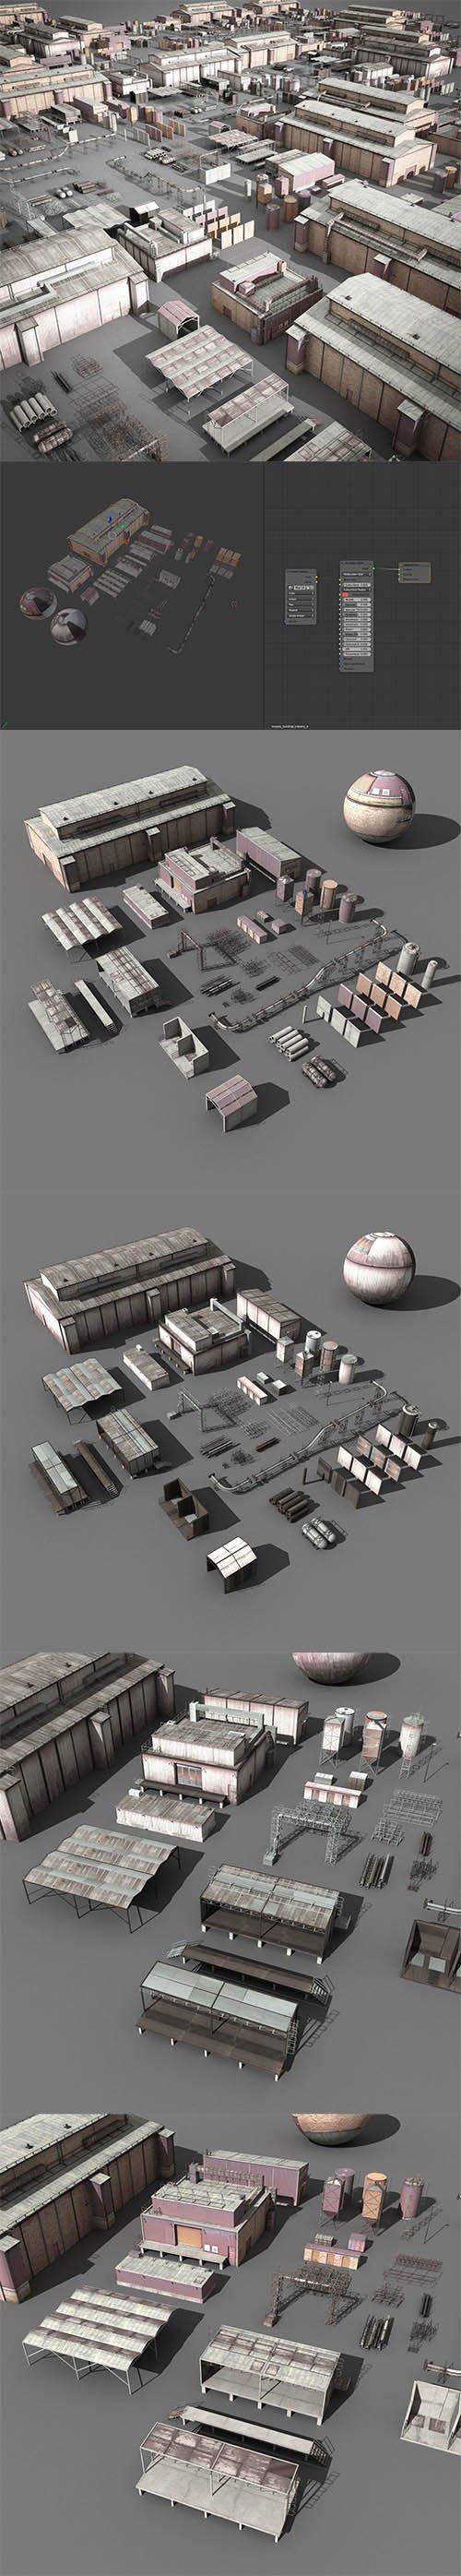 lowpoly buildings industry Low-poly 3D model